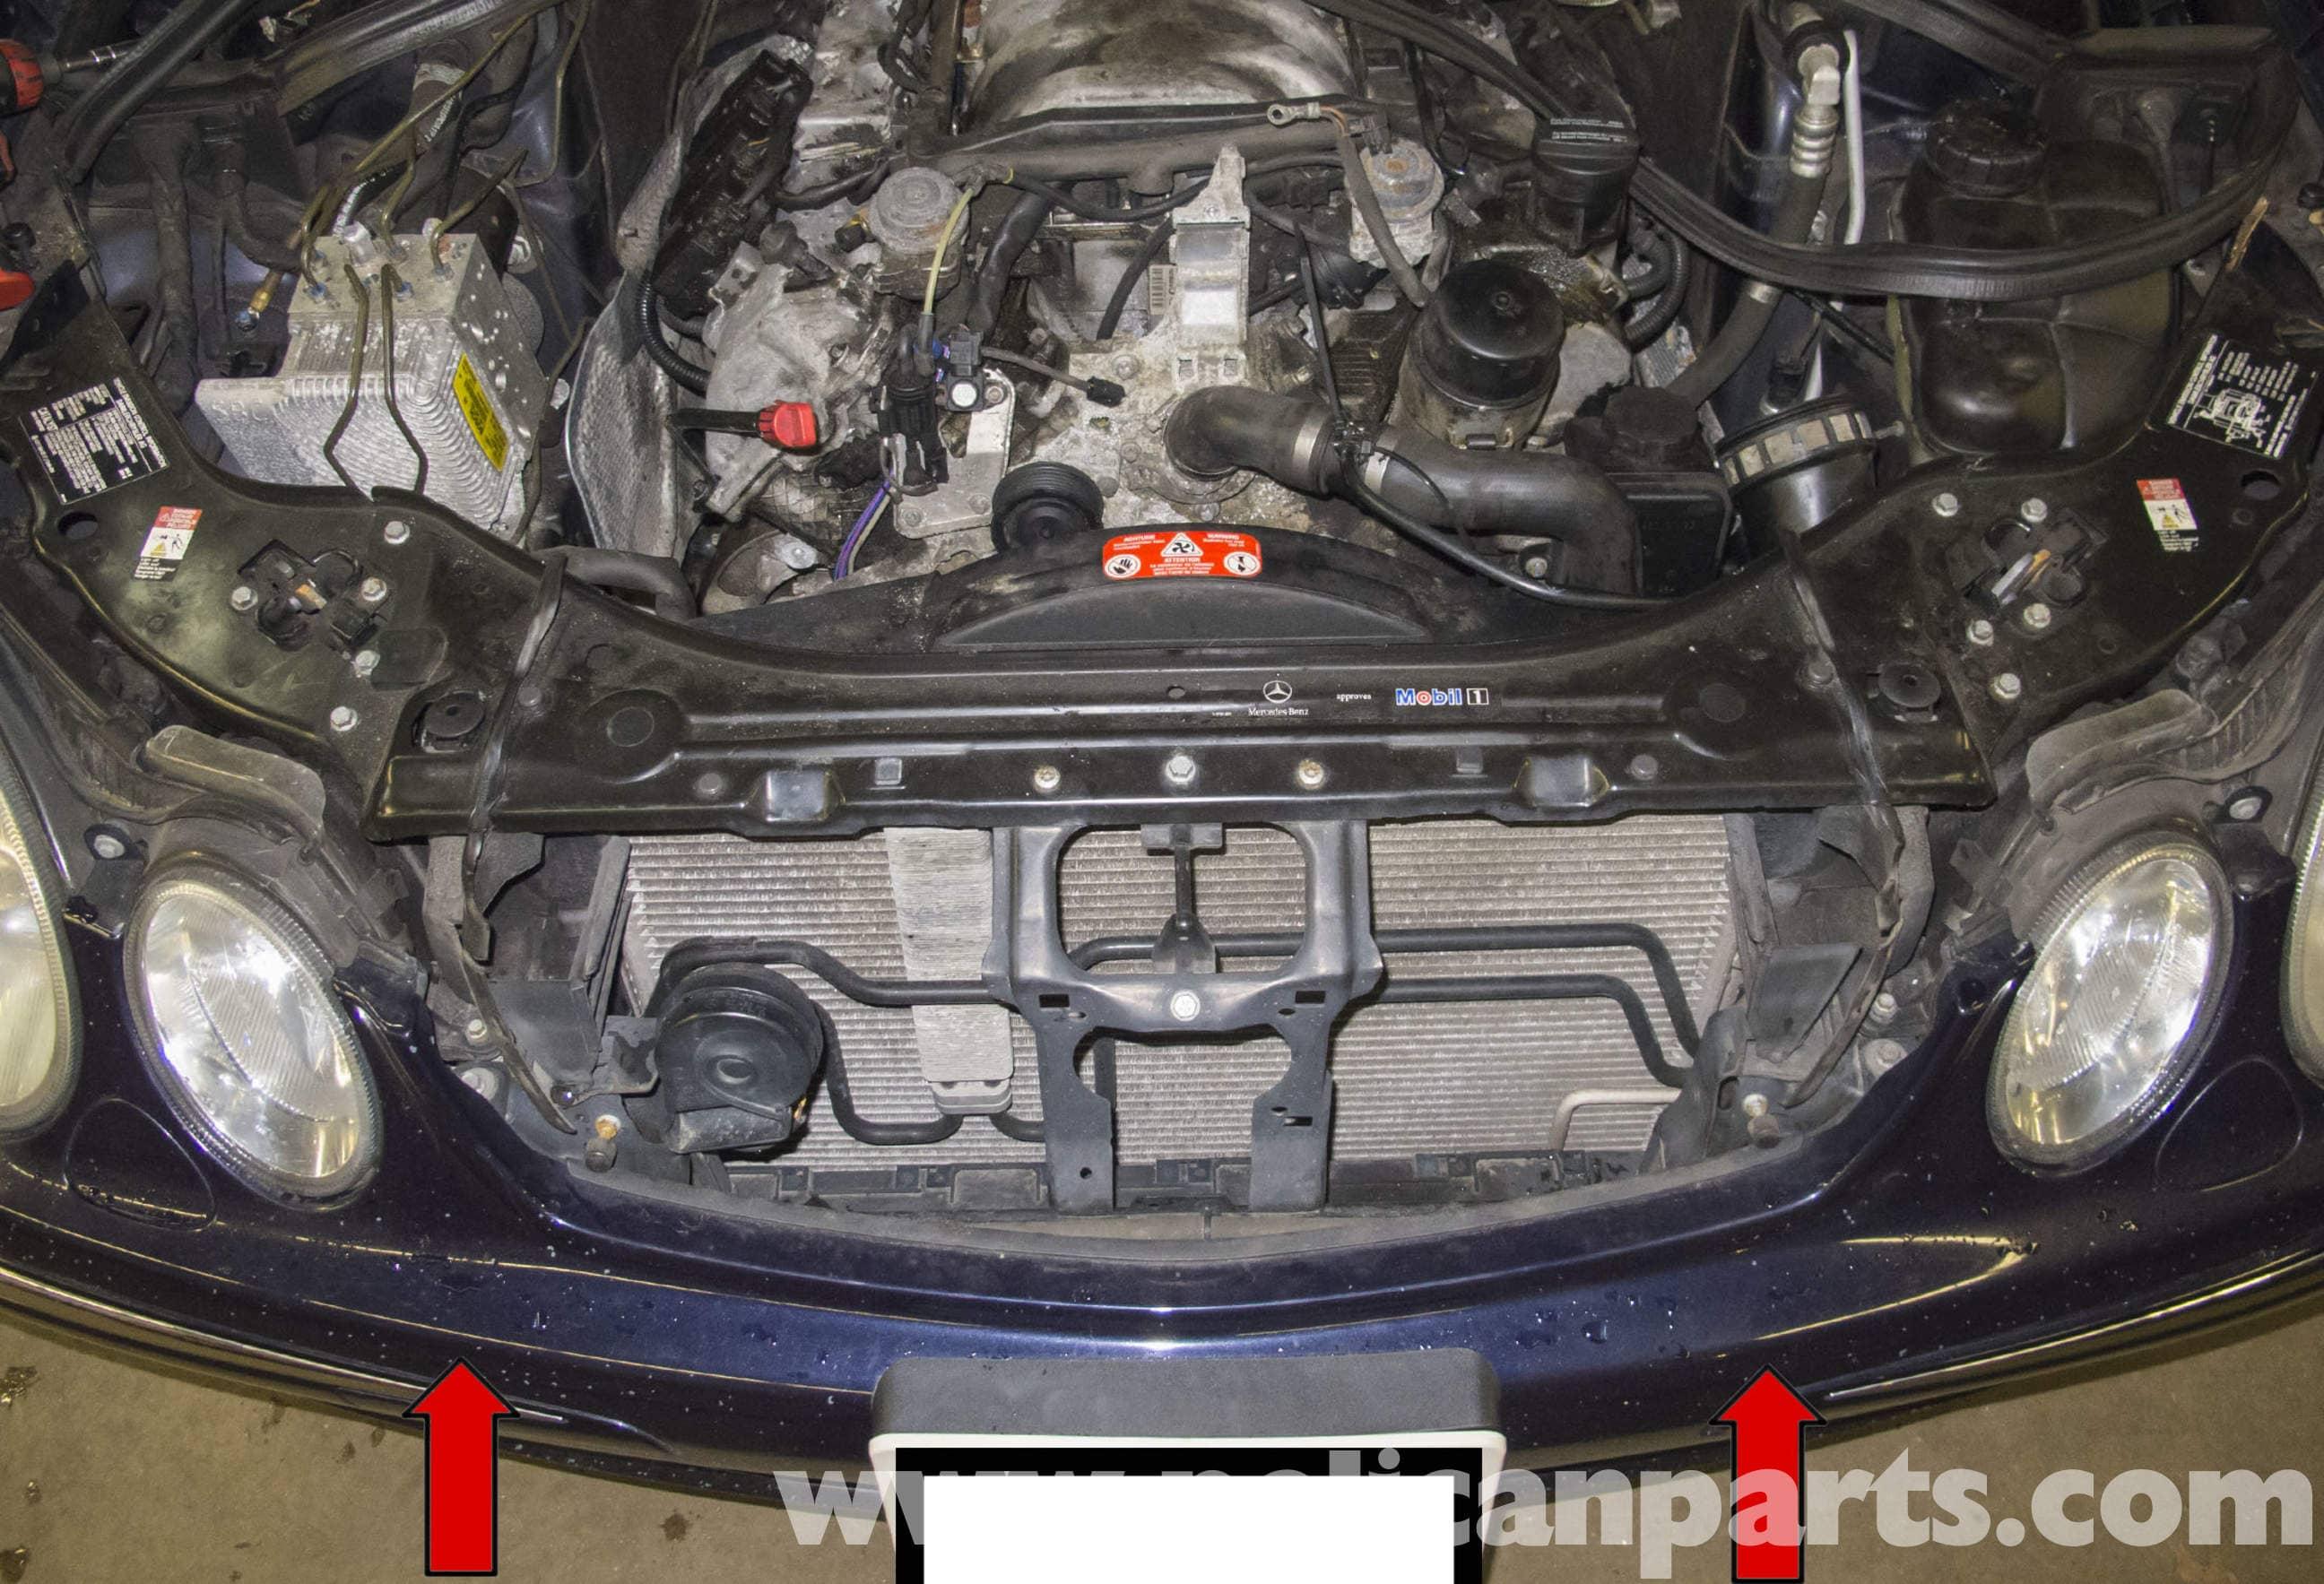 Mercedes-Benz W211 Front Bumper Replacement (2003-2009 ...